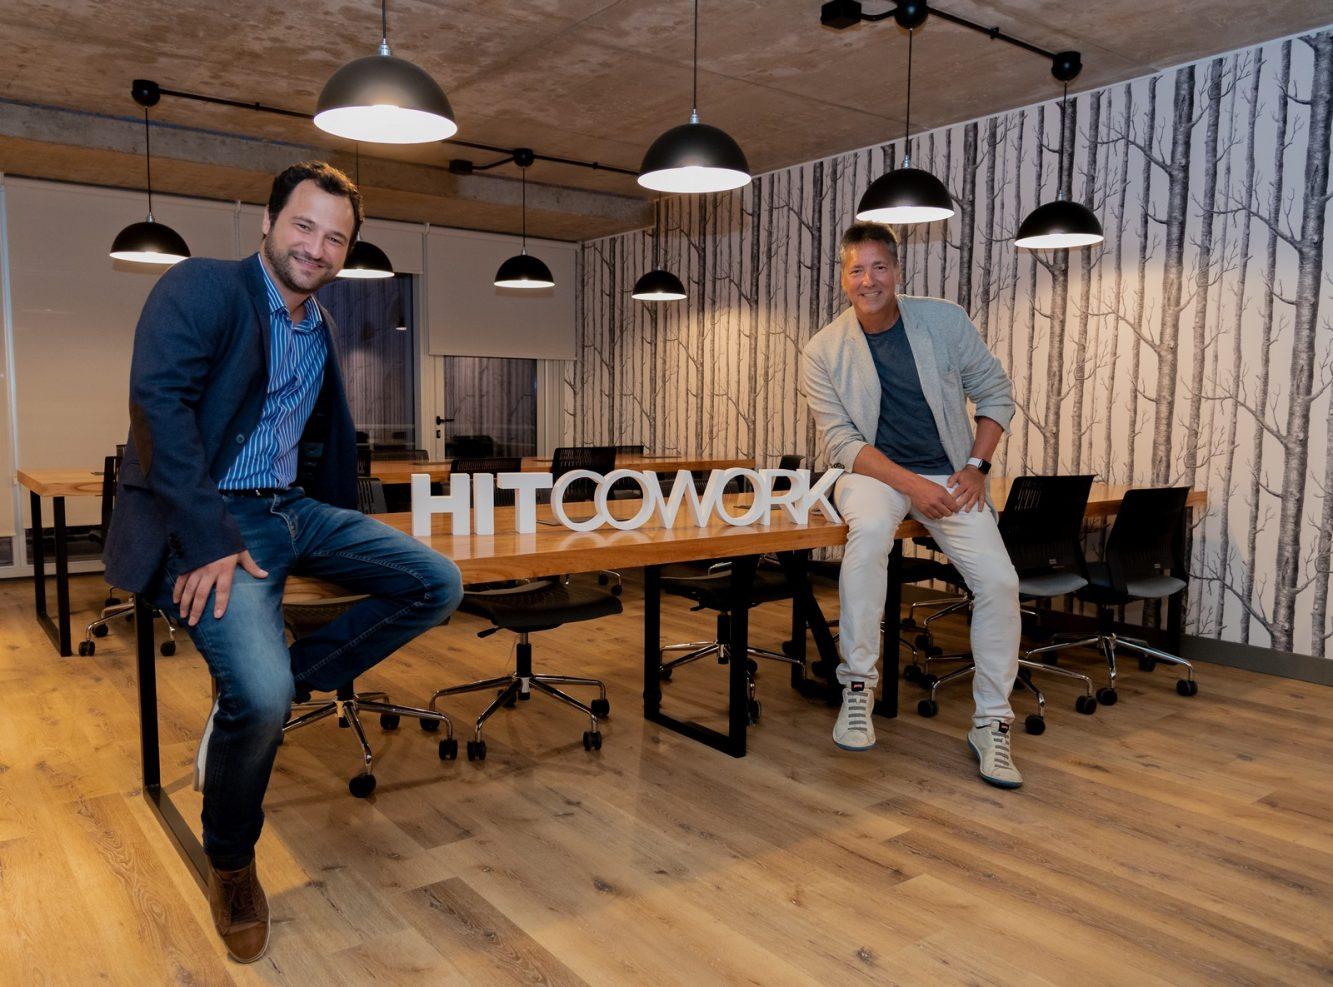 Uri Iskin y Alejandro Gawianski_HIT Cowork (Copiar)